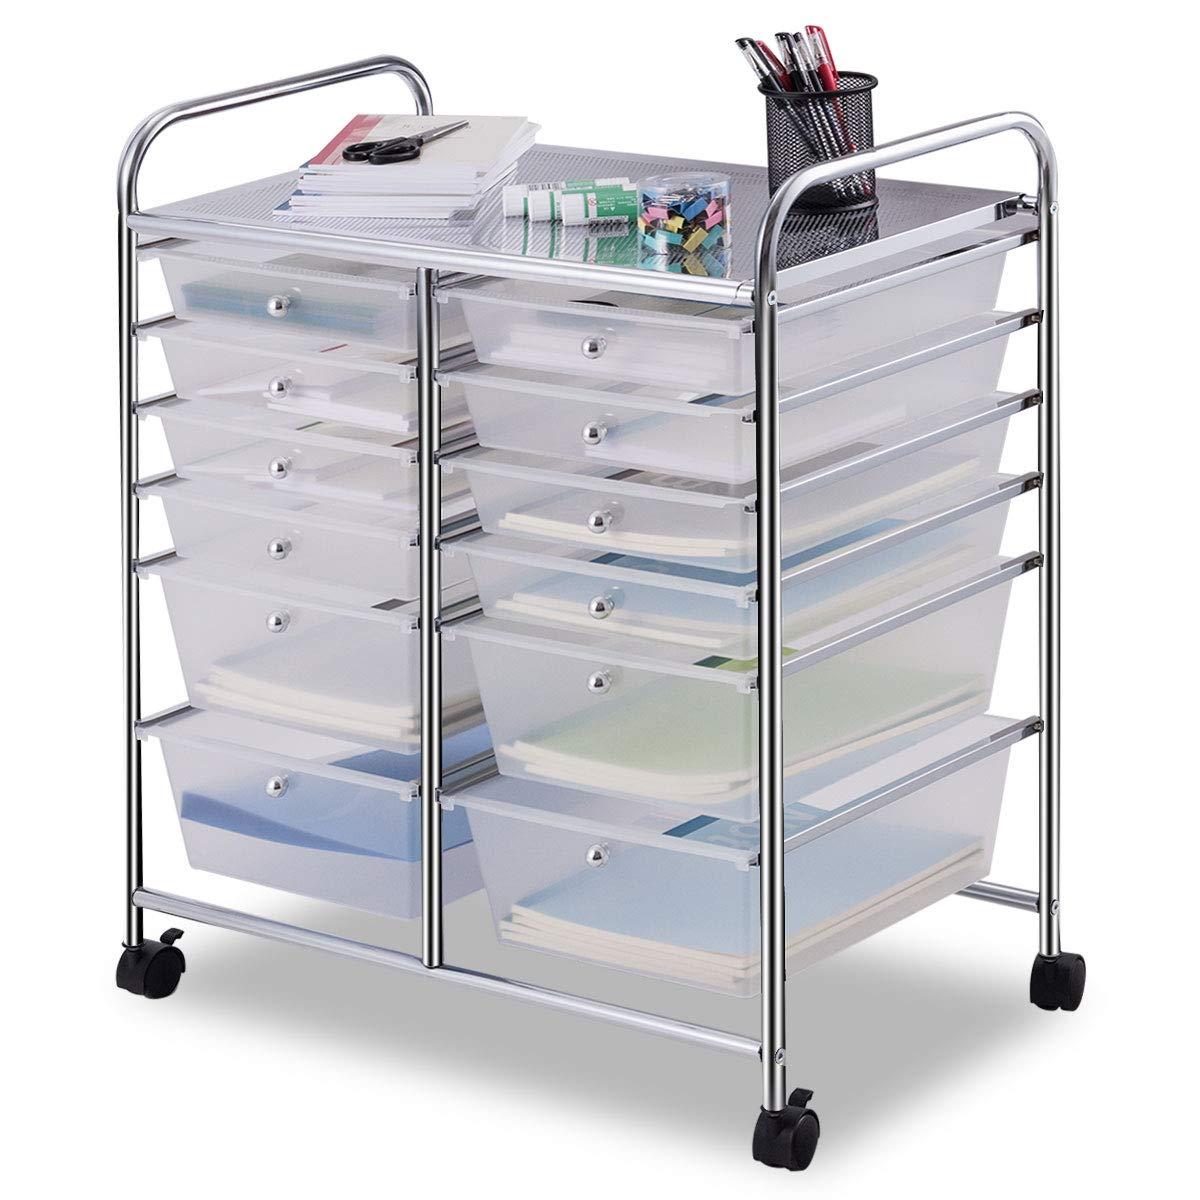 Giantex 12 Drawer Rolling Storage Cart Tools Scrapbook Paper Office School Organizer by Giantex